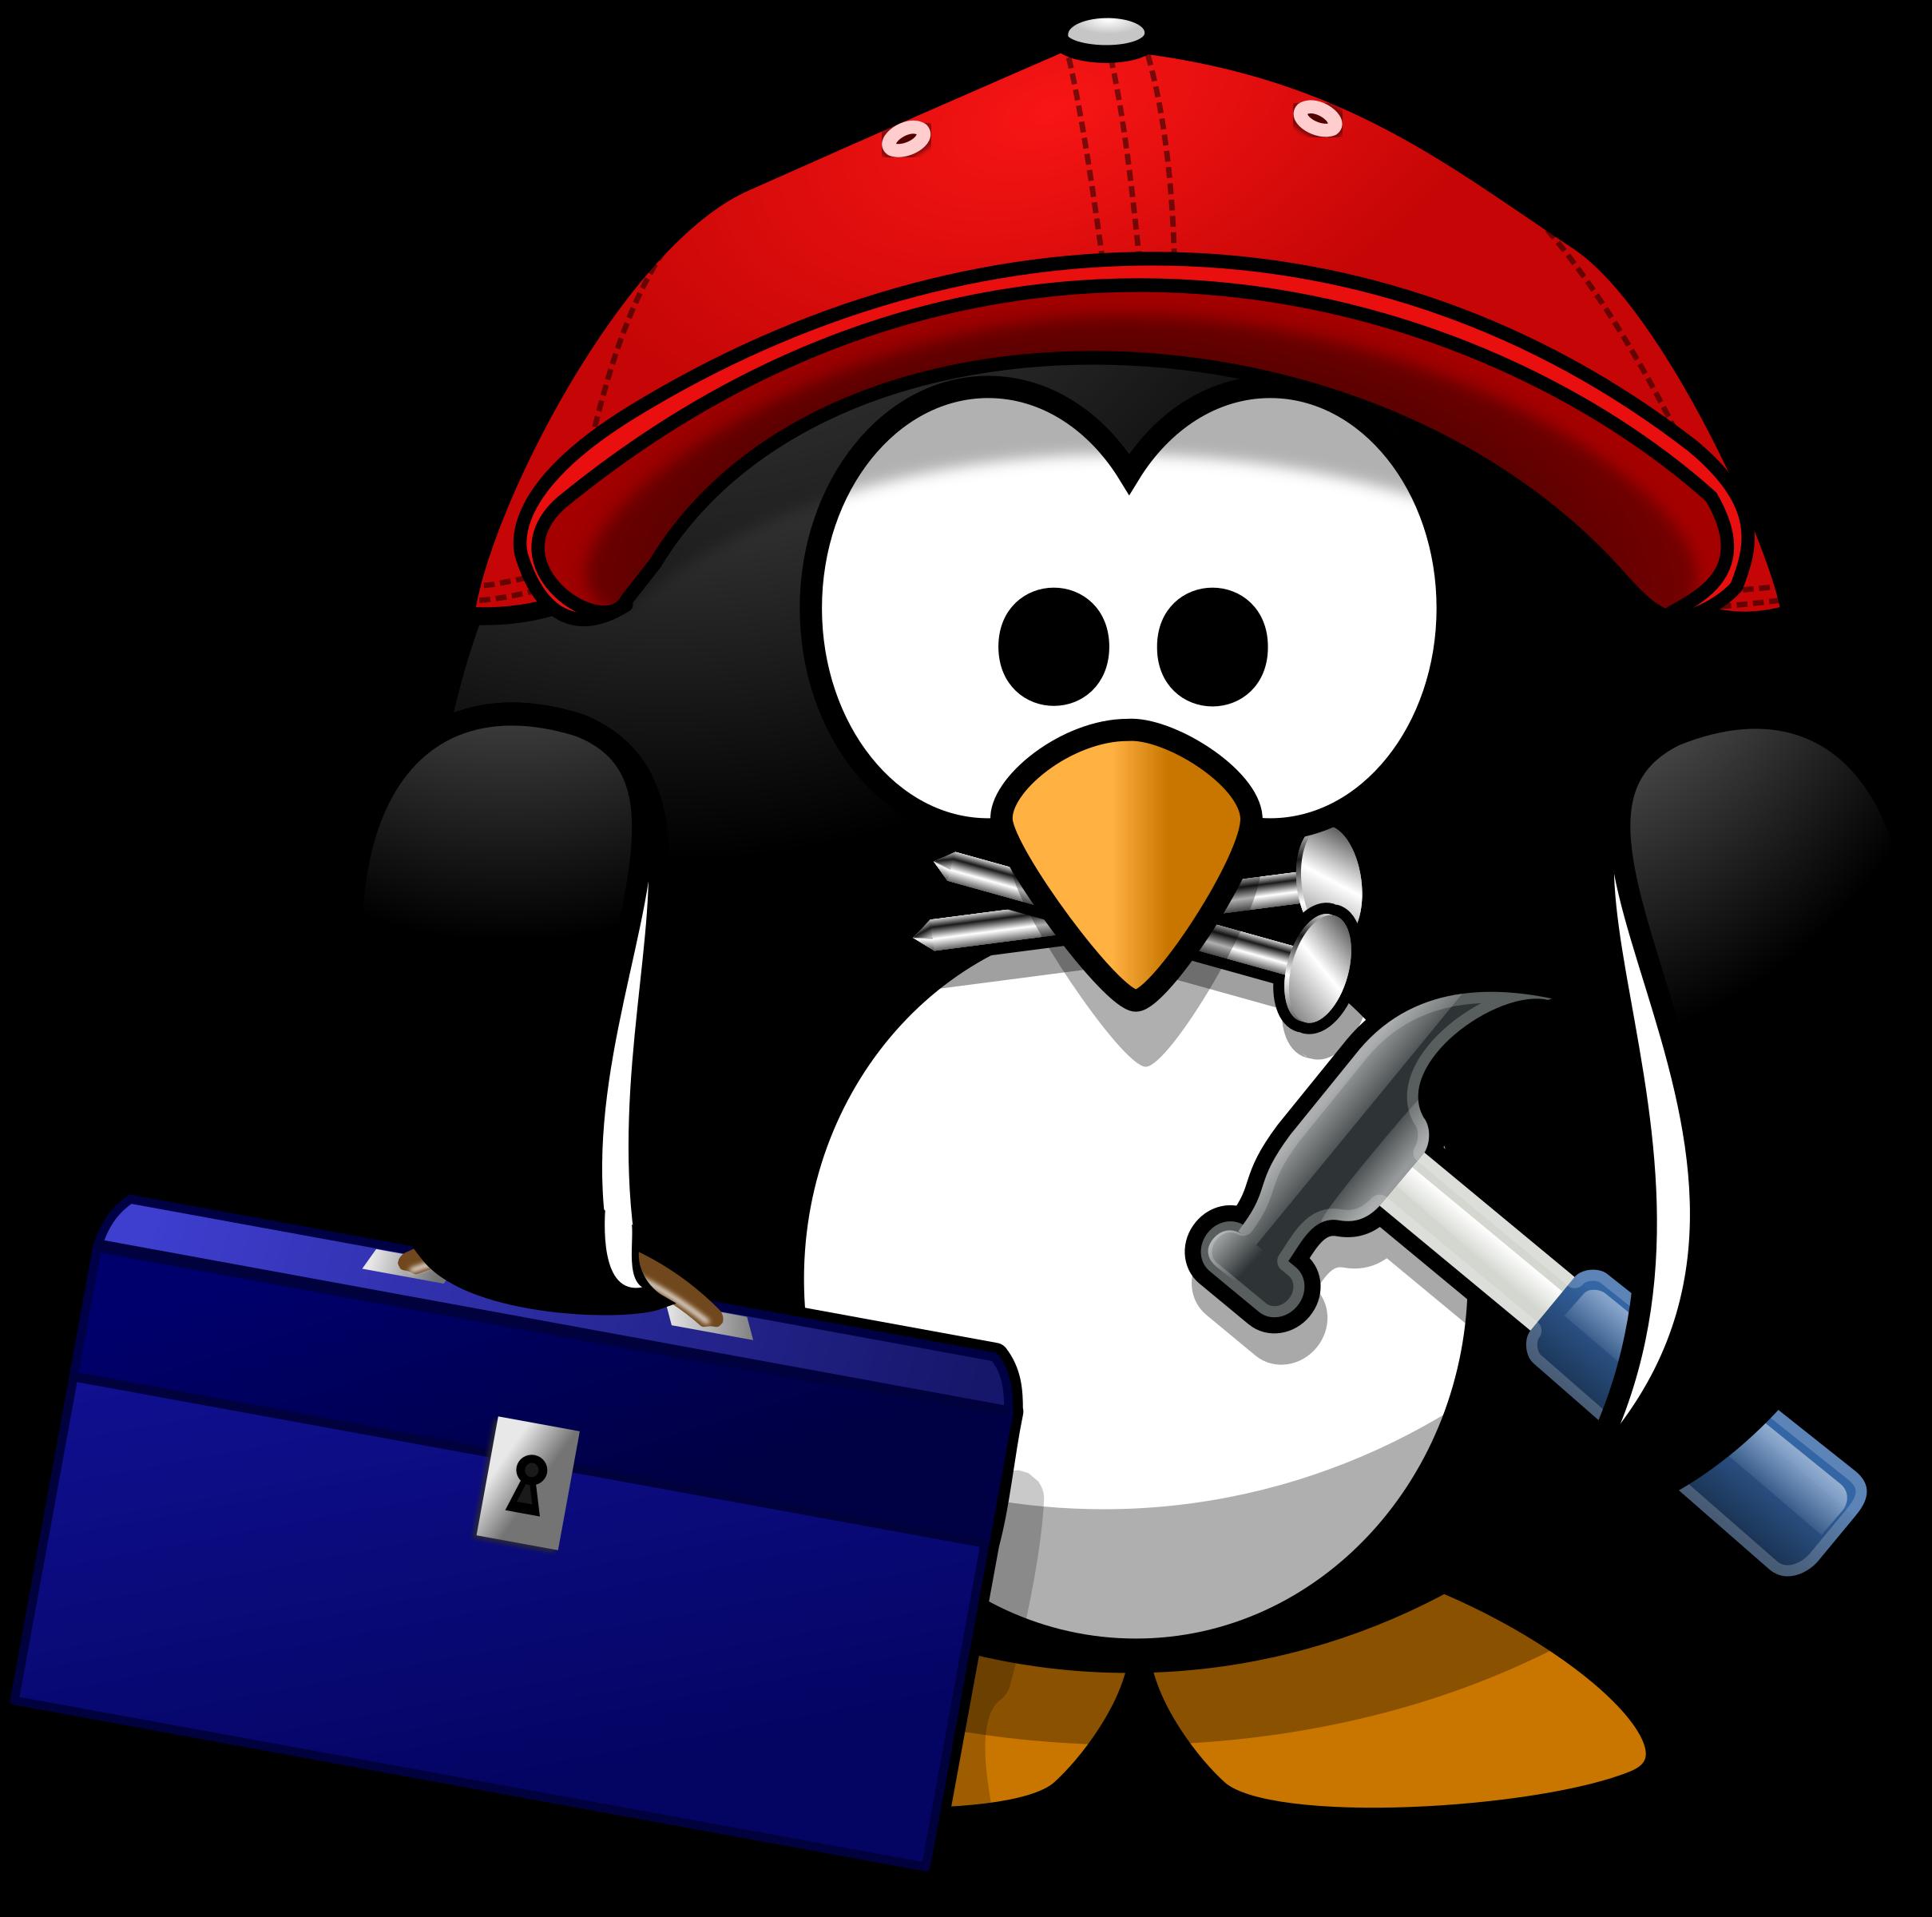 Craftsman big image png. Clipart penguin computer